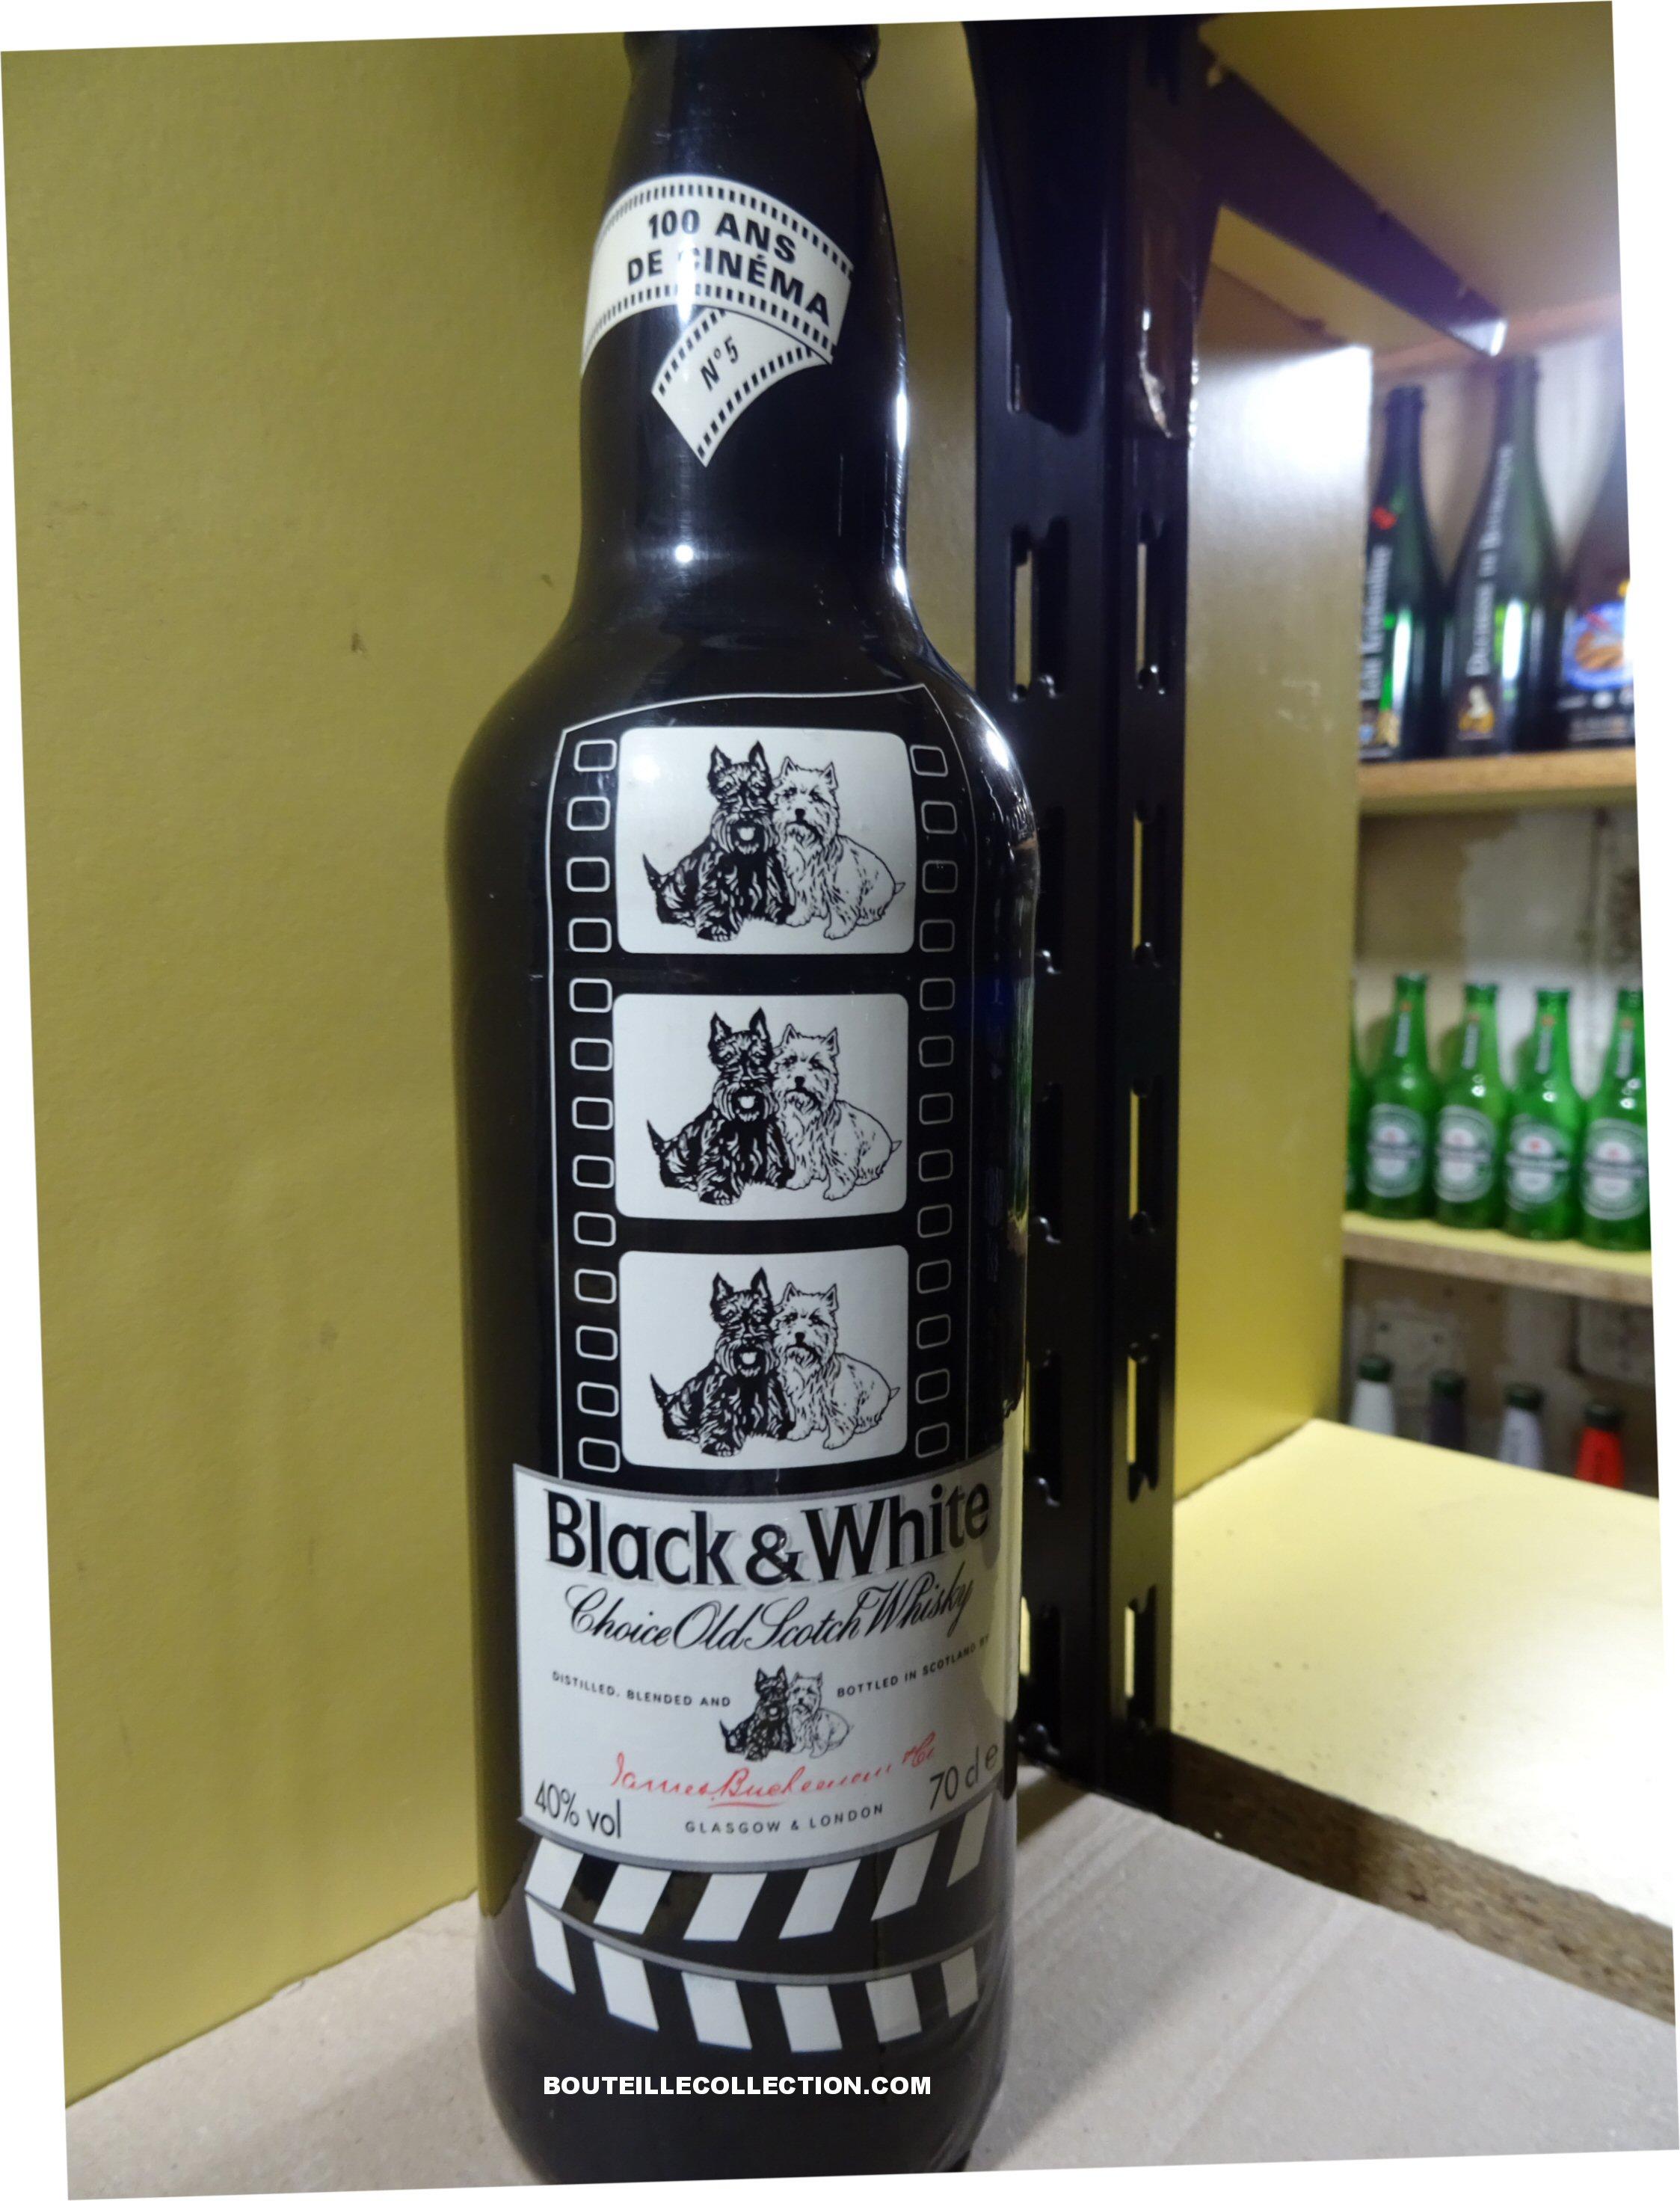 BLACK & WHITE 100 ANS CINEMA 70CL B .JPG